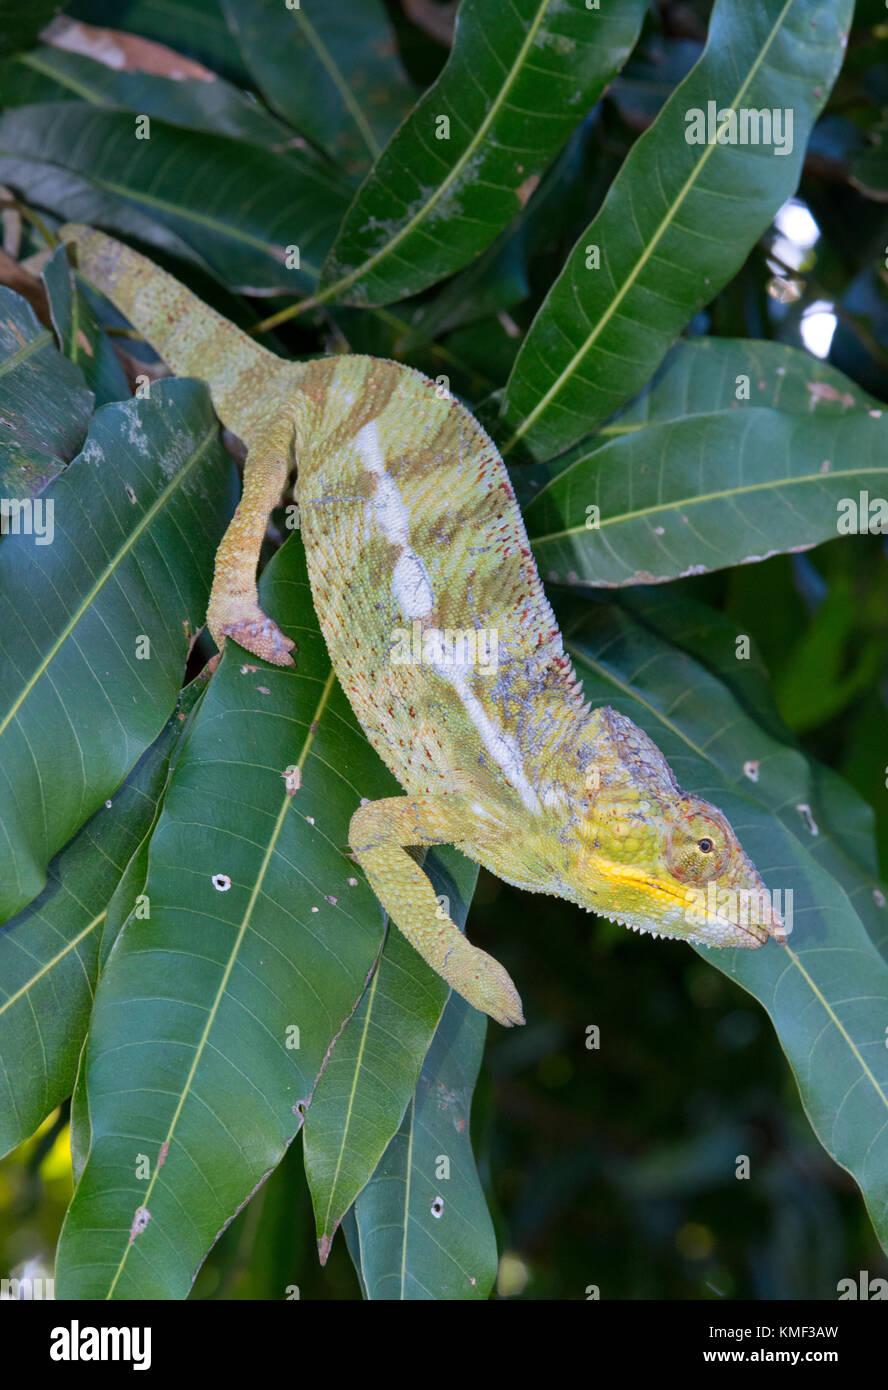 Panther chameleon (Furcifer pardalis, Chamaeleo pardalis), on a branch, Nosy be, Madagascar - Stock Image